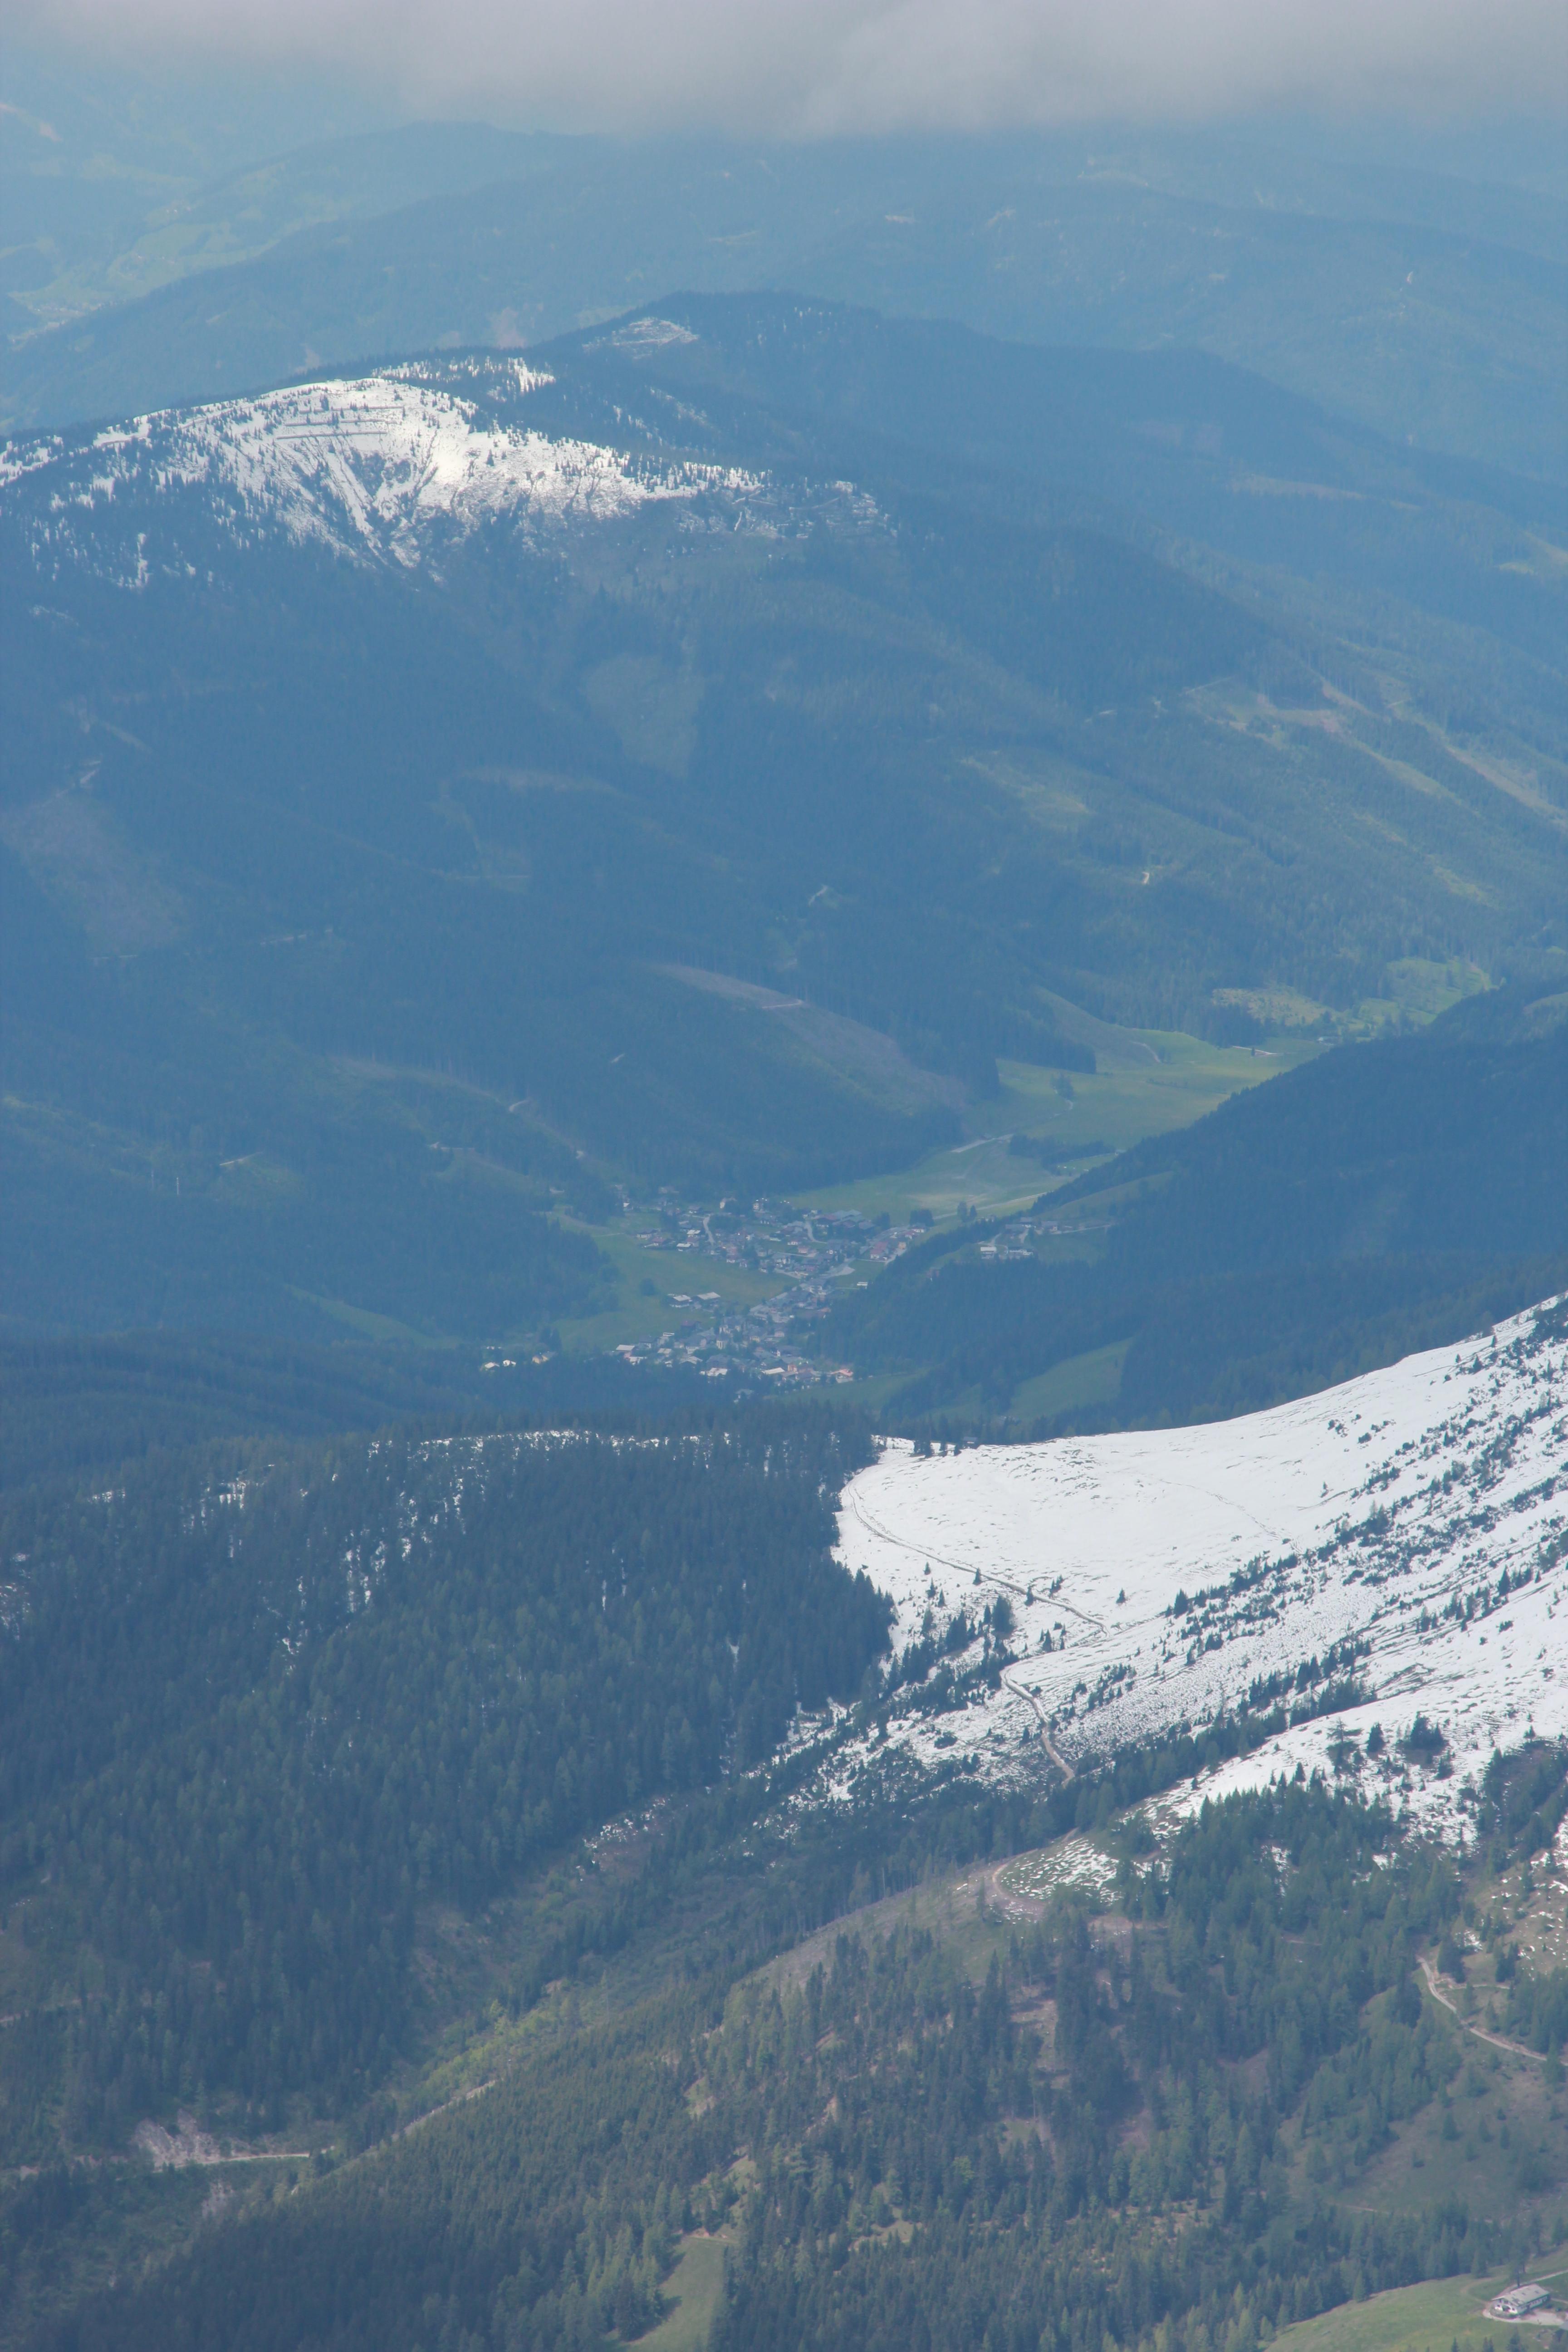 Вид на горы Дахштайн летом. Источник https://upload.wikimedia.org/